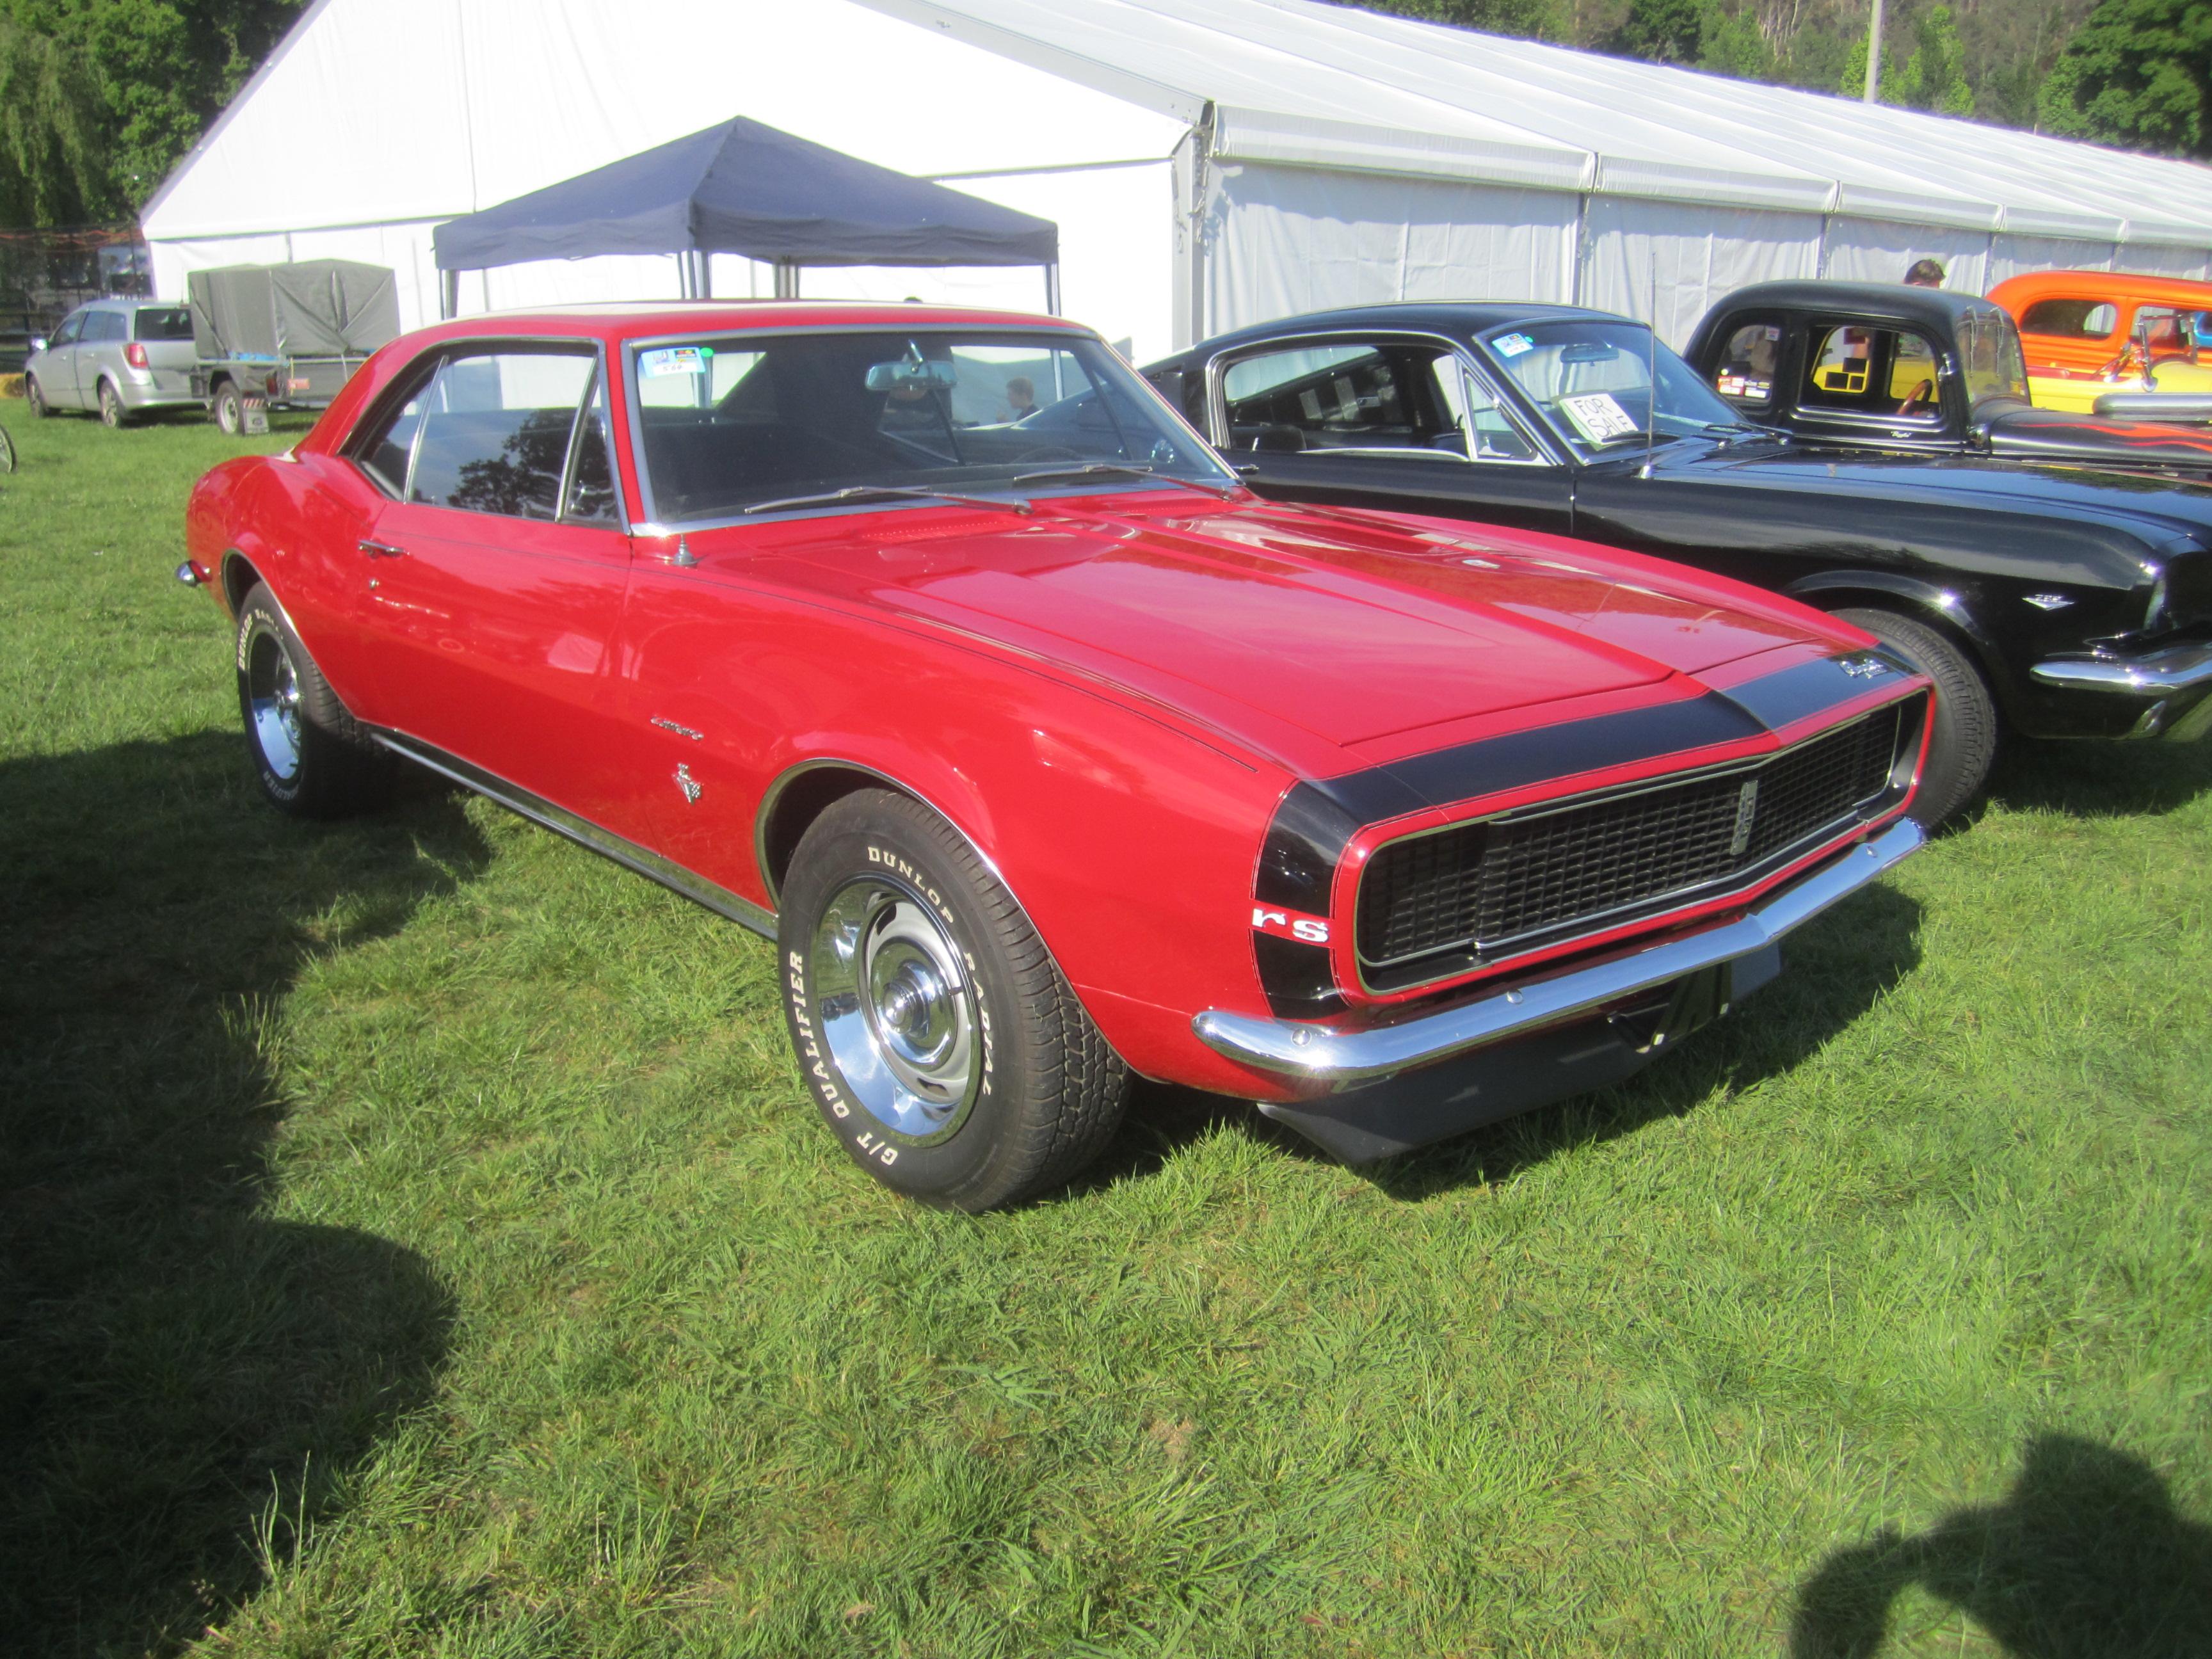 File:1967_Chevrolet_Camaro_RSon 1967 Camaro Ss 396